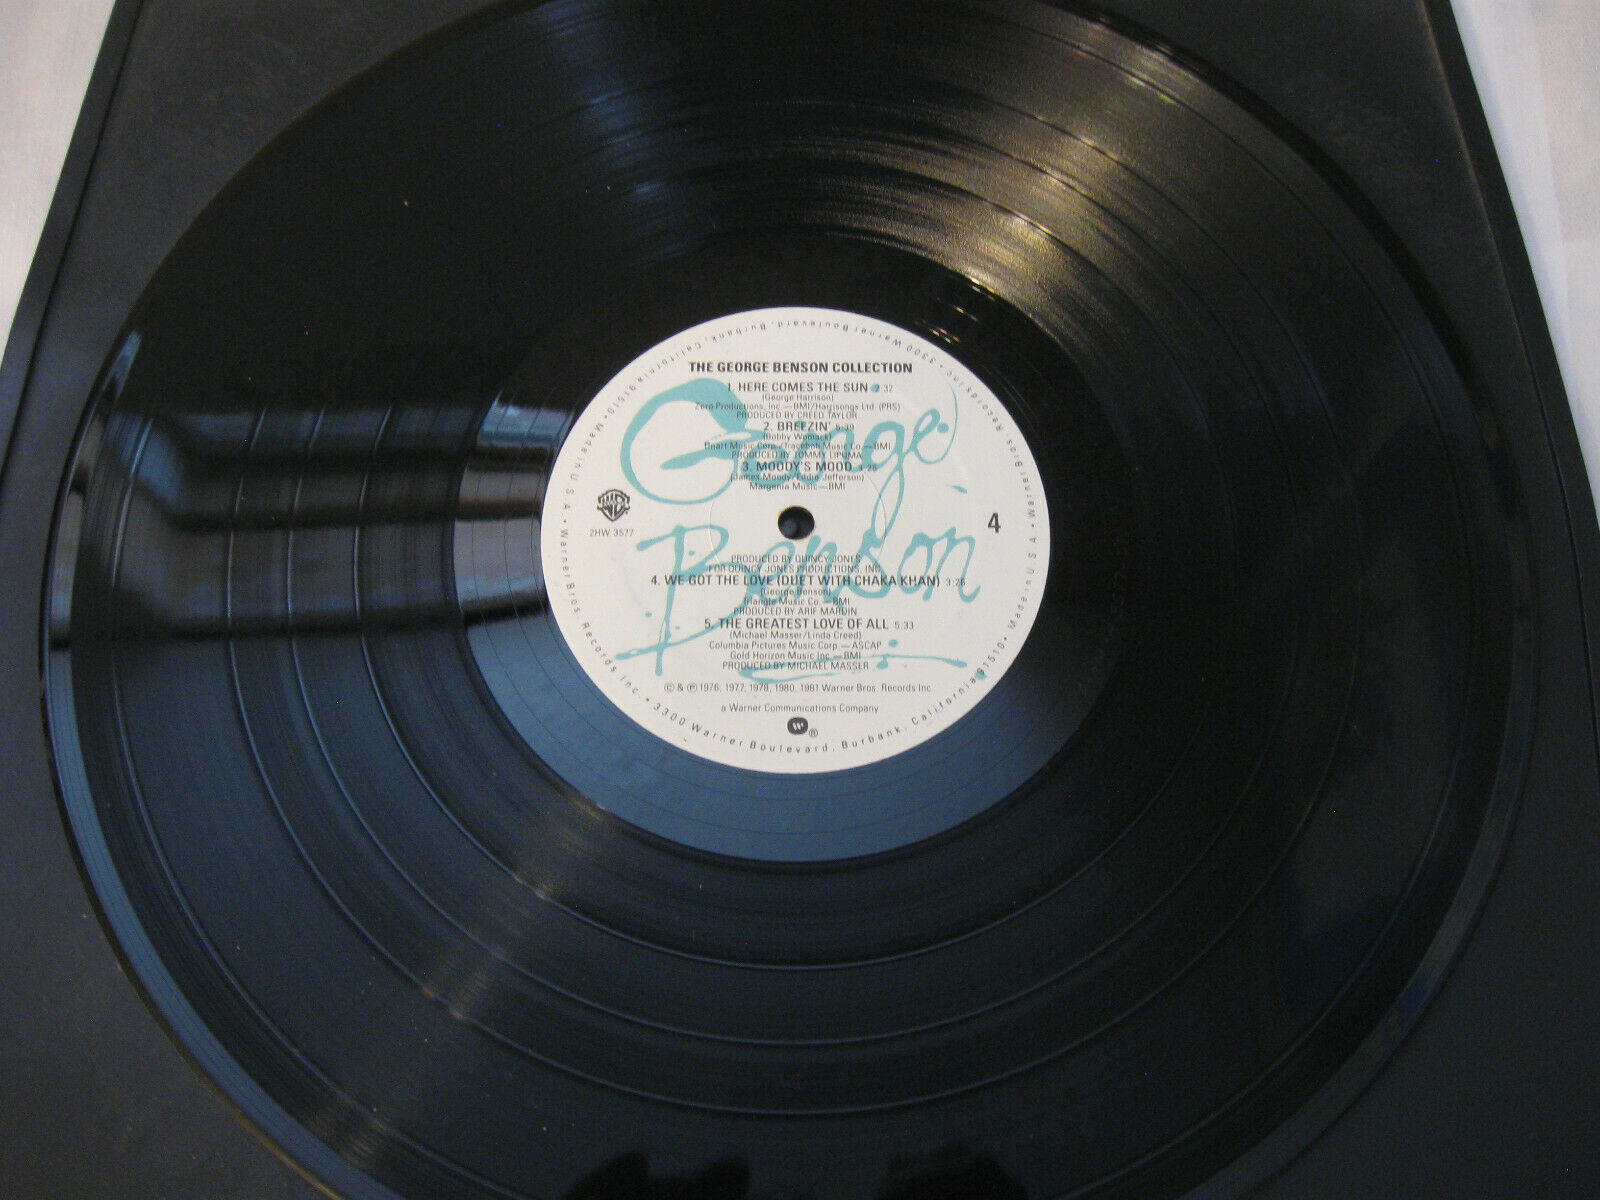 The George Benson Collection Warner Bros 2HW 3577 Stereo Vinyl Record LP Album image 11